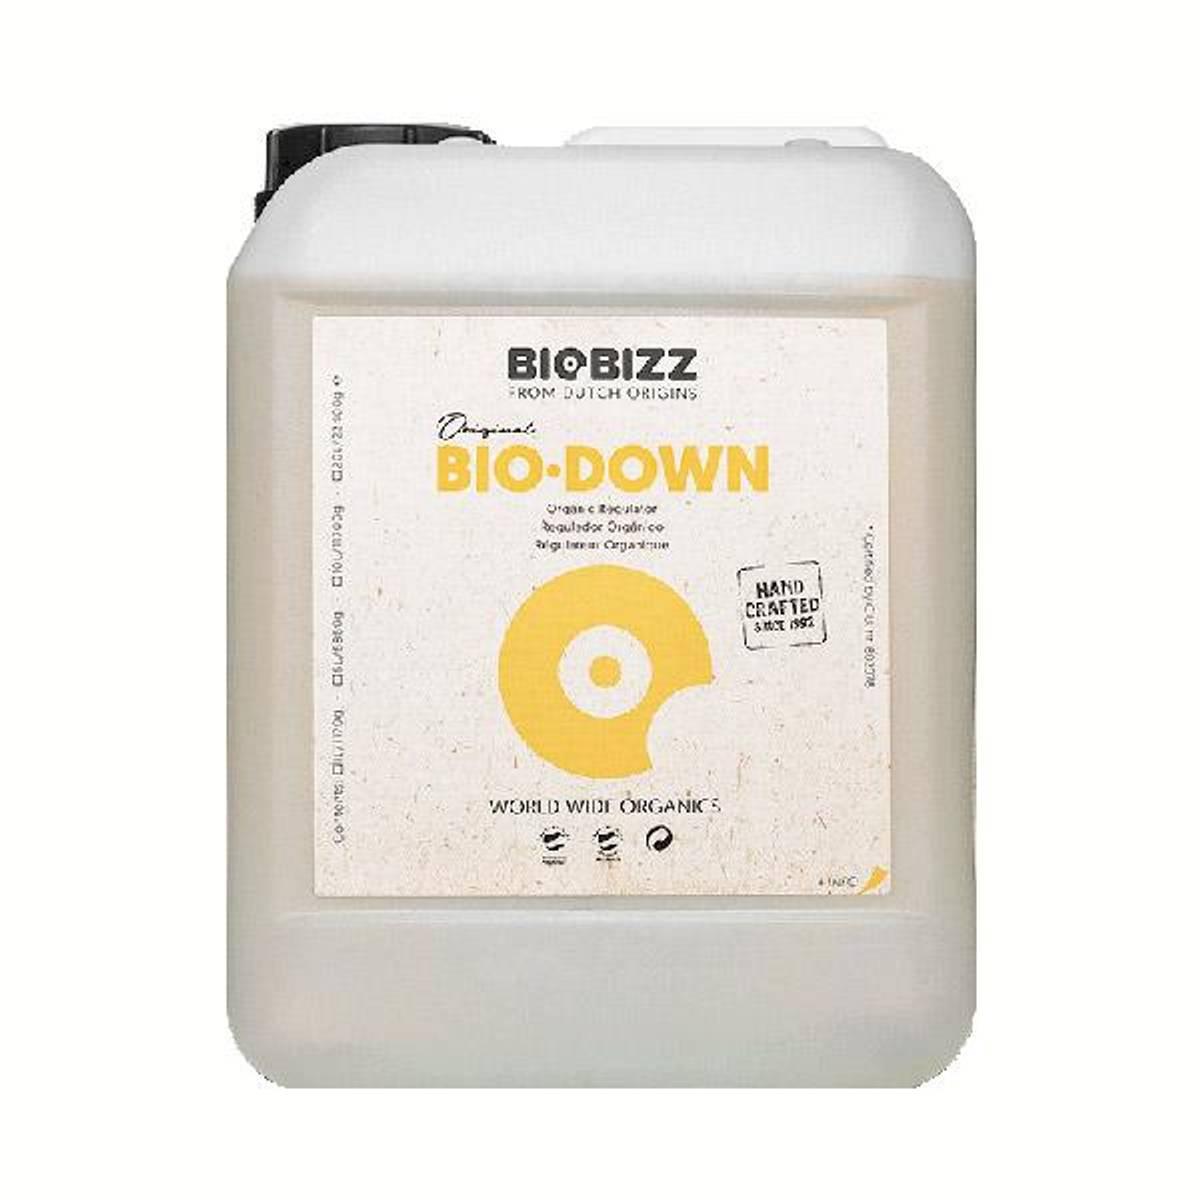 Bio pH- 5 liter, Biobizz